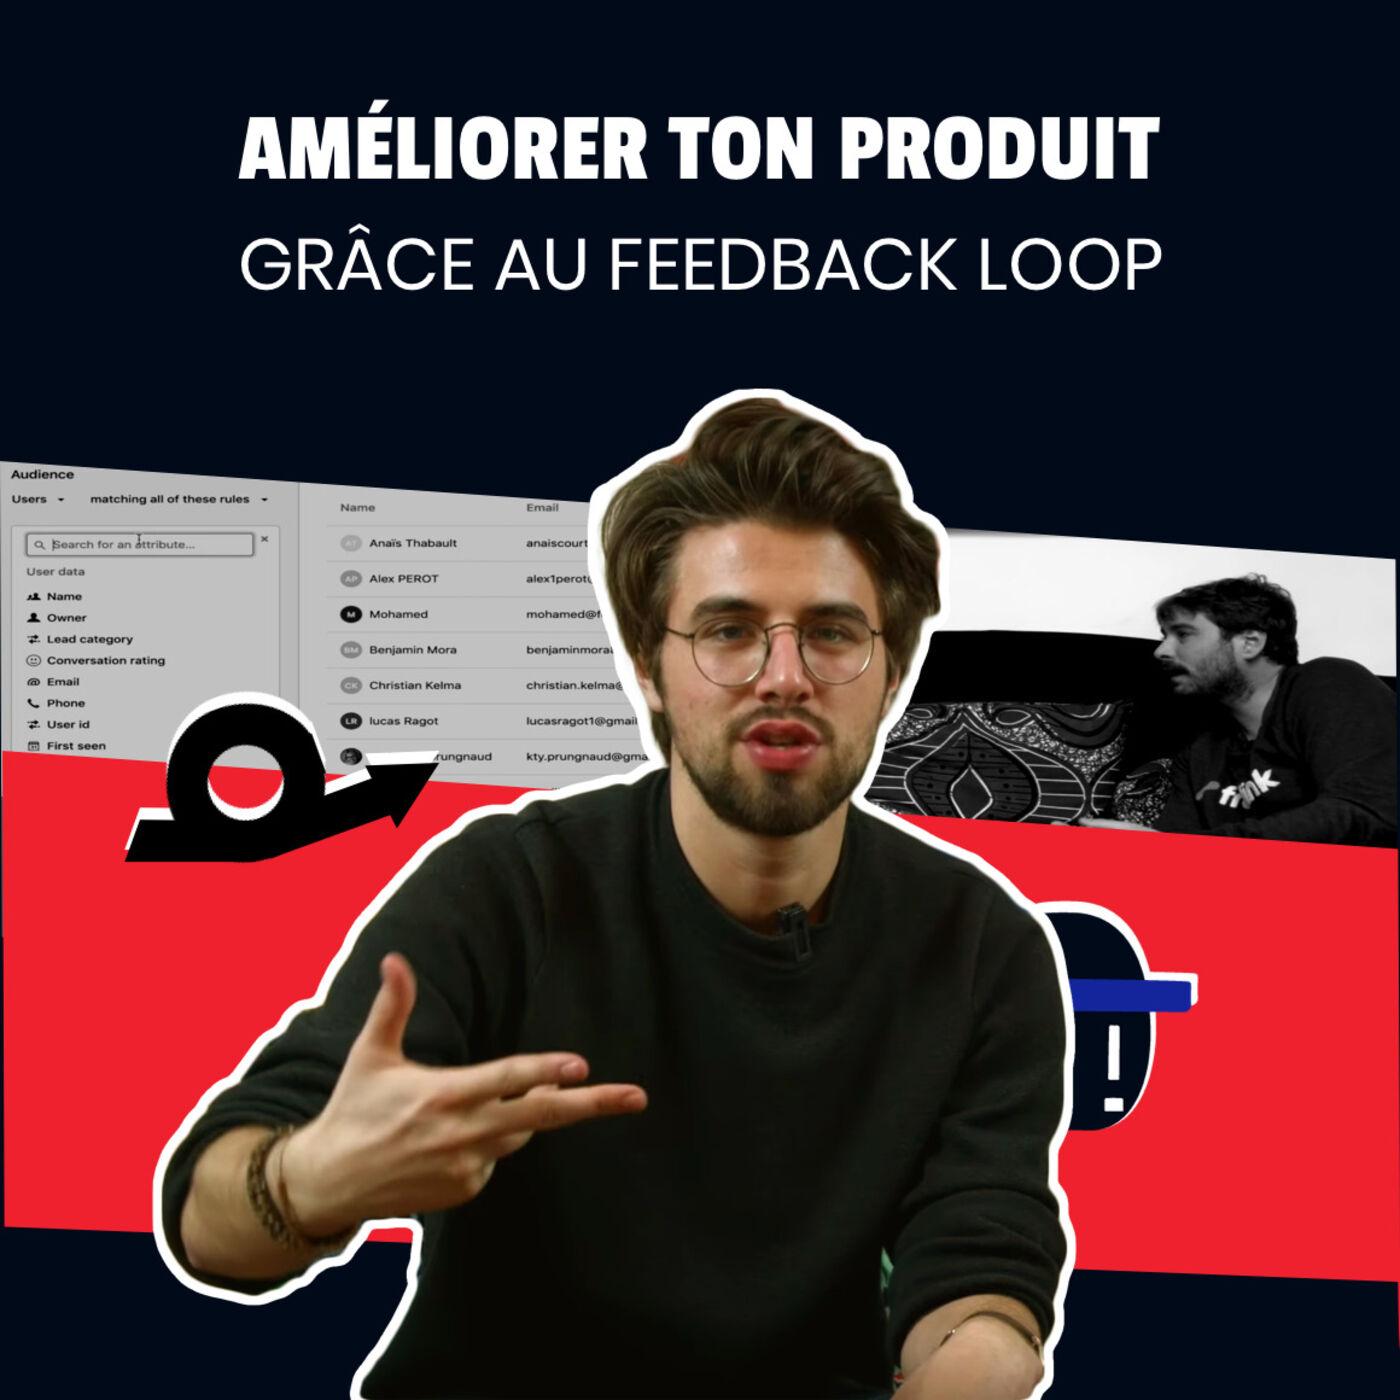 Ep 5 - Améliorer ton produit grâce au feedback loop I Saison 2 Koudetat Entreprendre